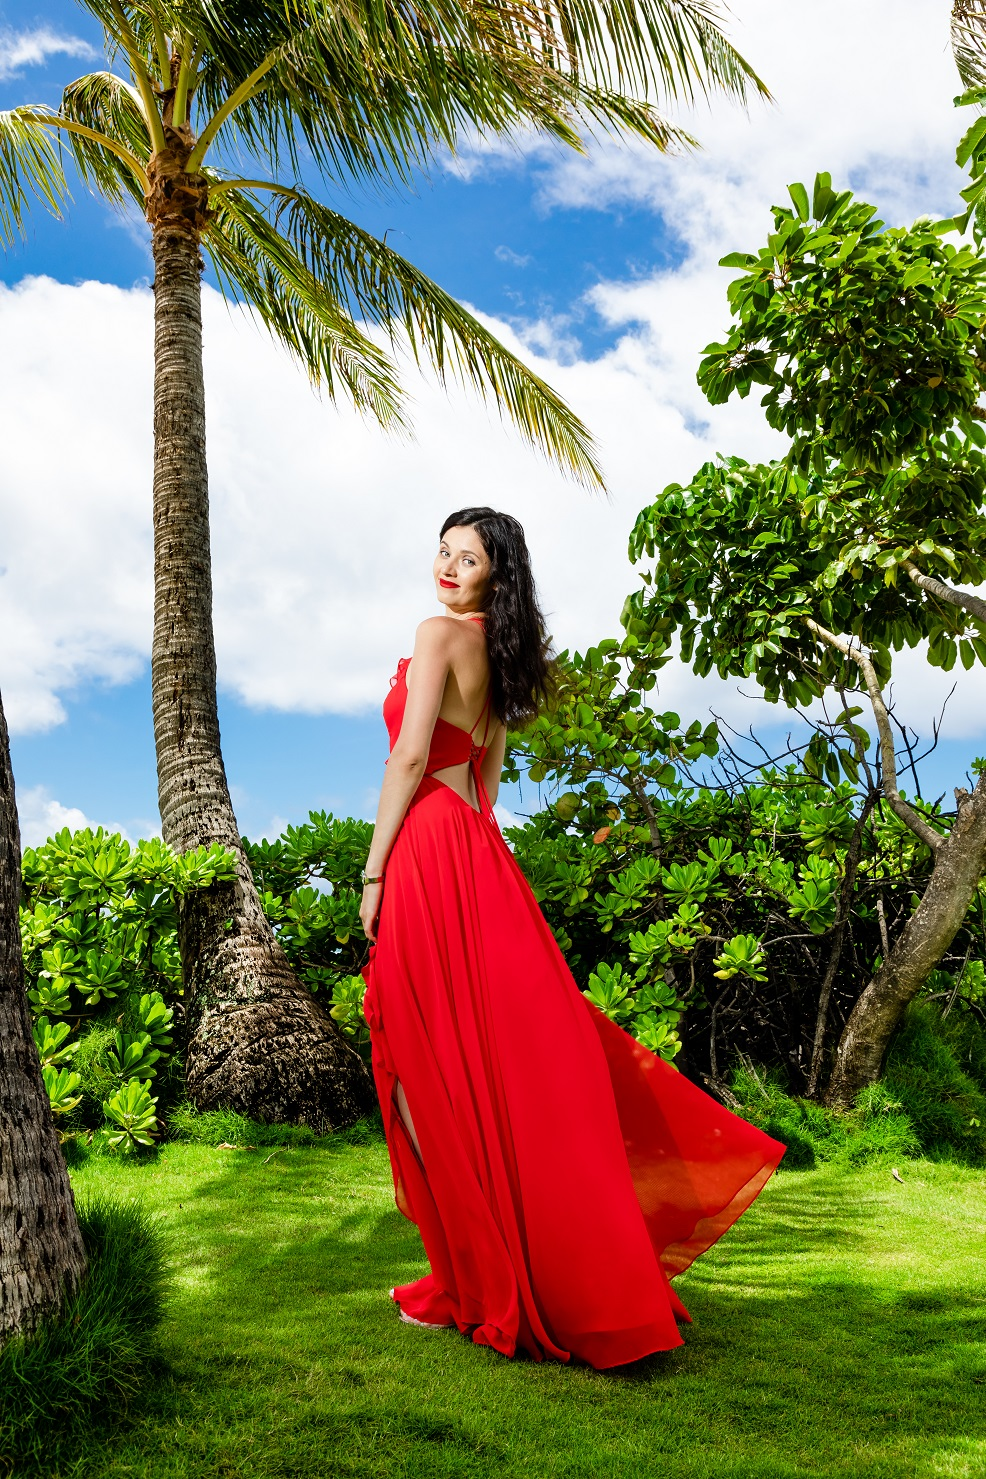 Oahu2018-43229.jpg